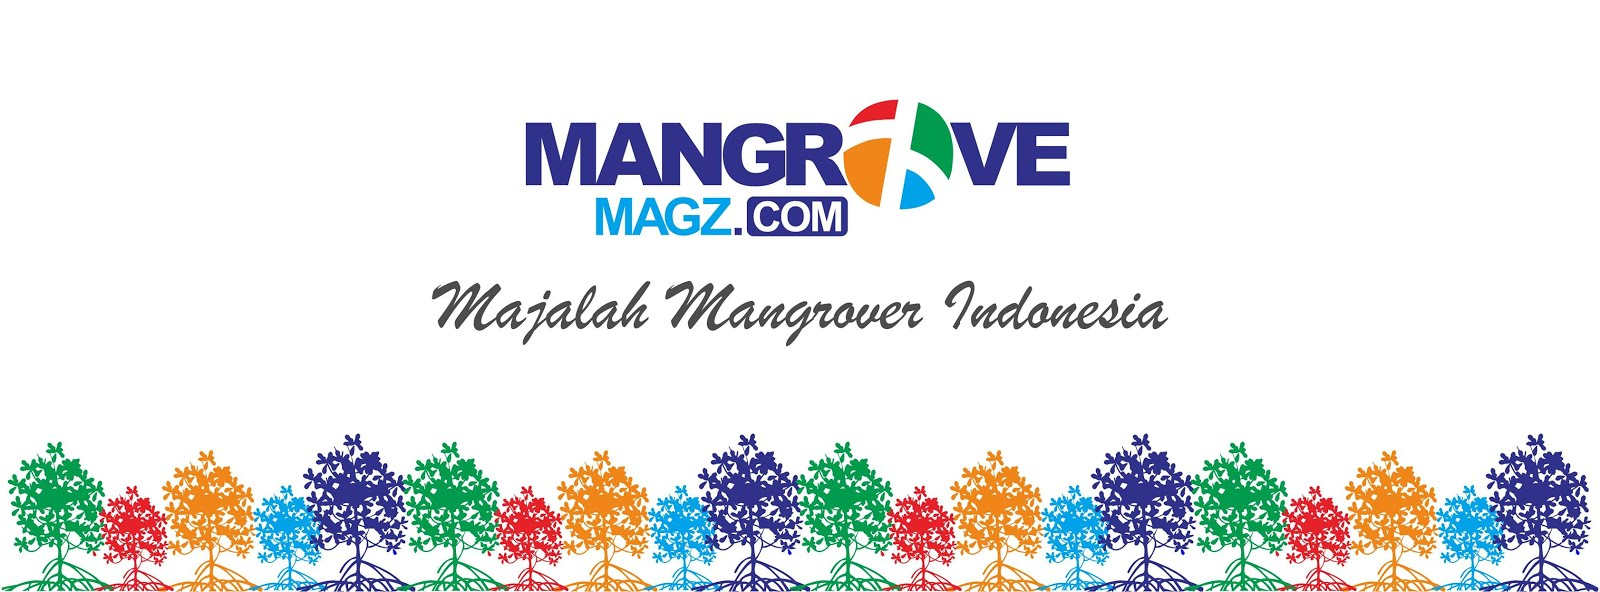 Blog MANGROVEMAGZ | Blog Majalah Mangrover Indonesia